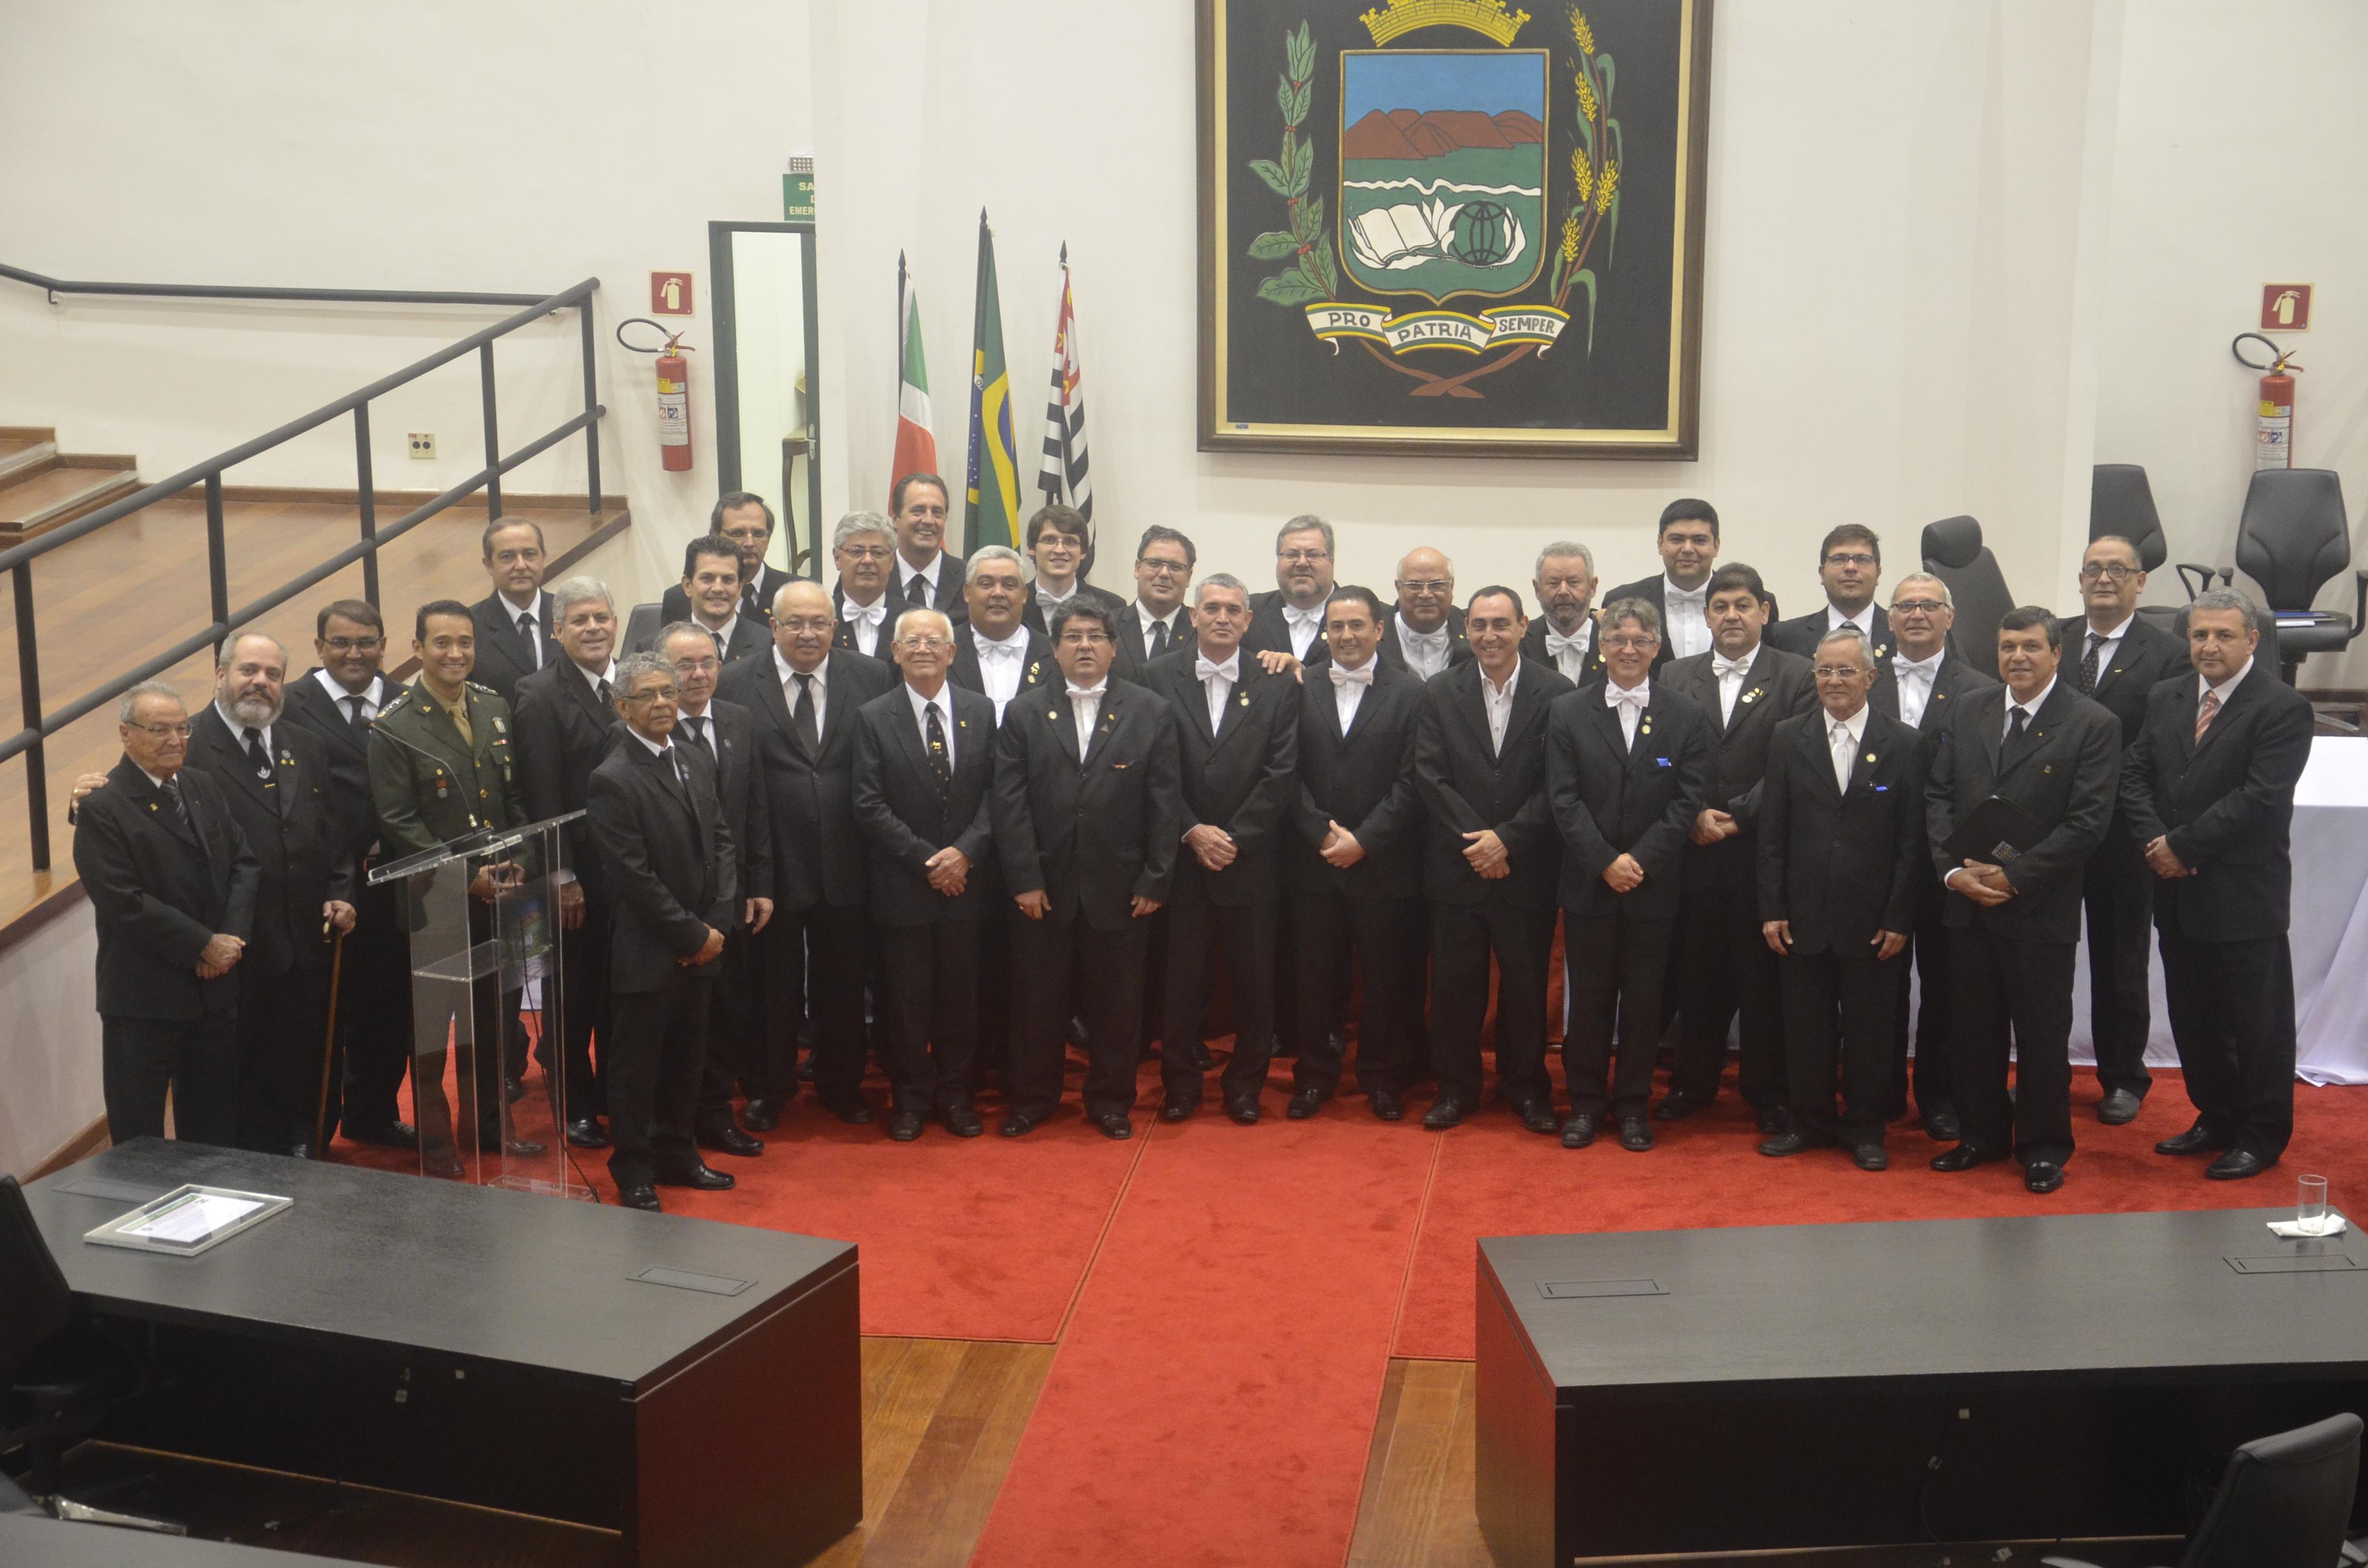 Dia do Maçom é comemorado na Câmara de Vereadores de Pindamonhangaba